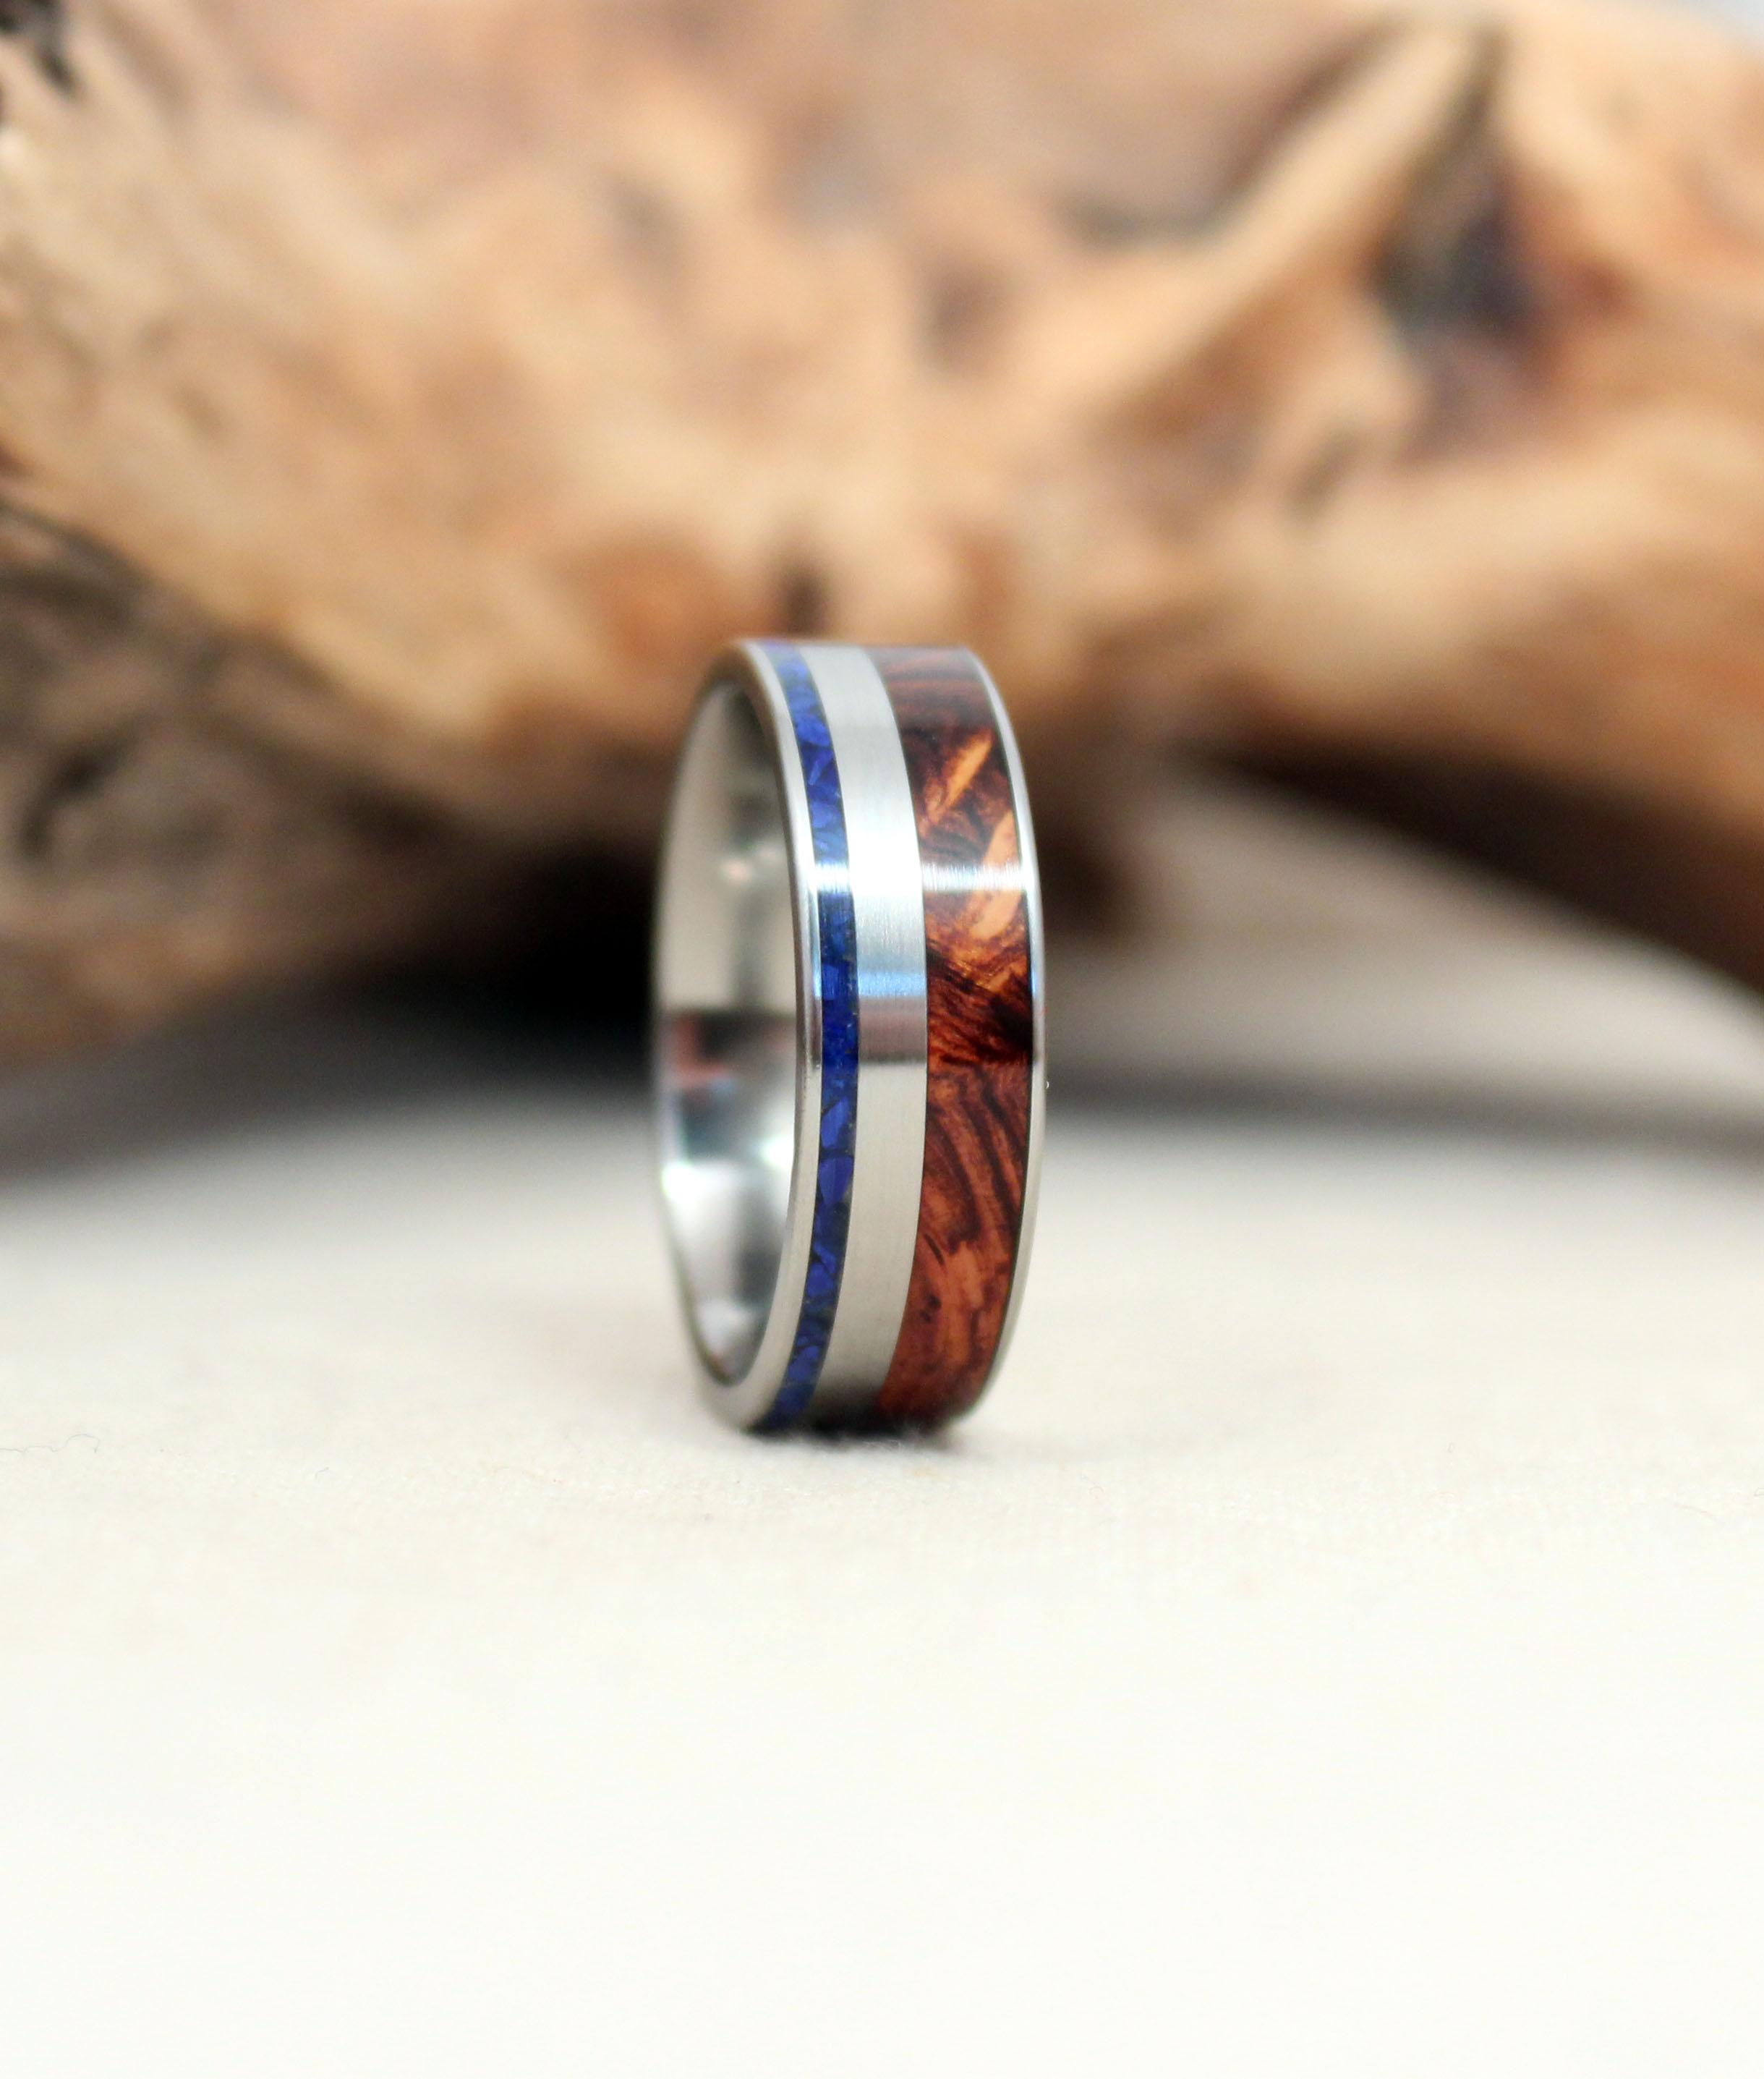 Honduras Rosewood Burl and Lapis Lazuli Deconstructed Titanium and Wood Ring